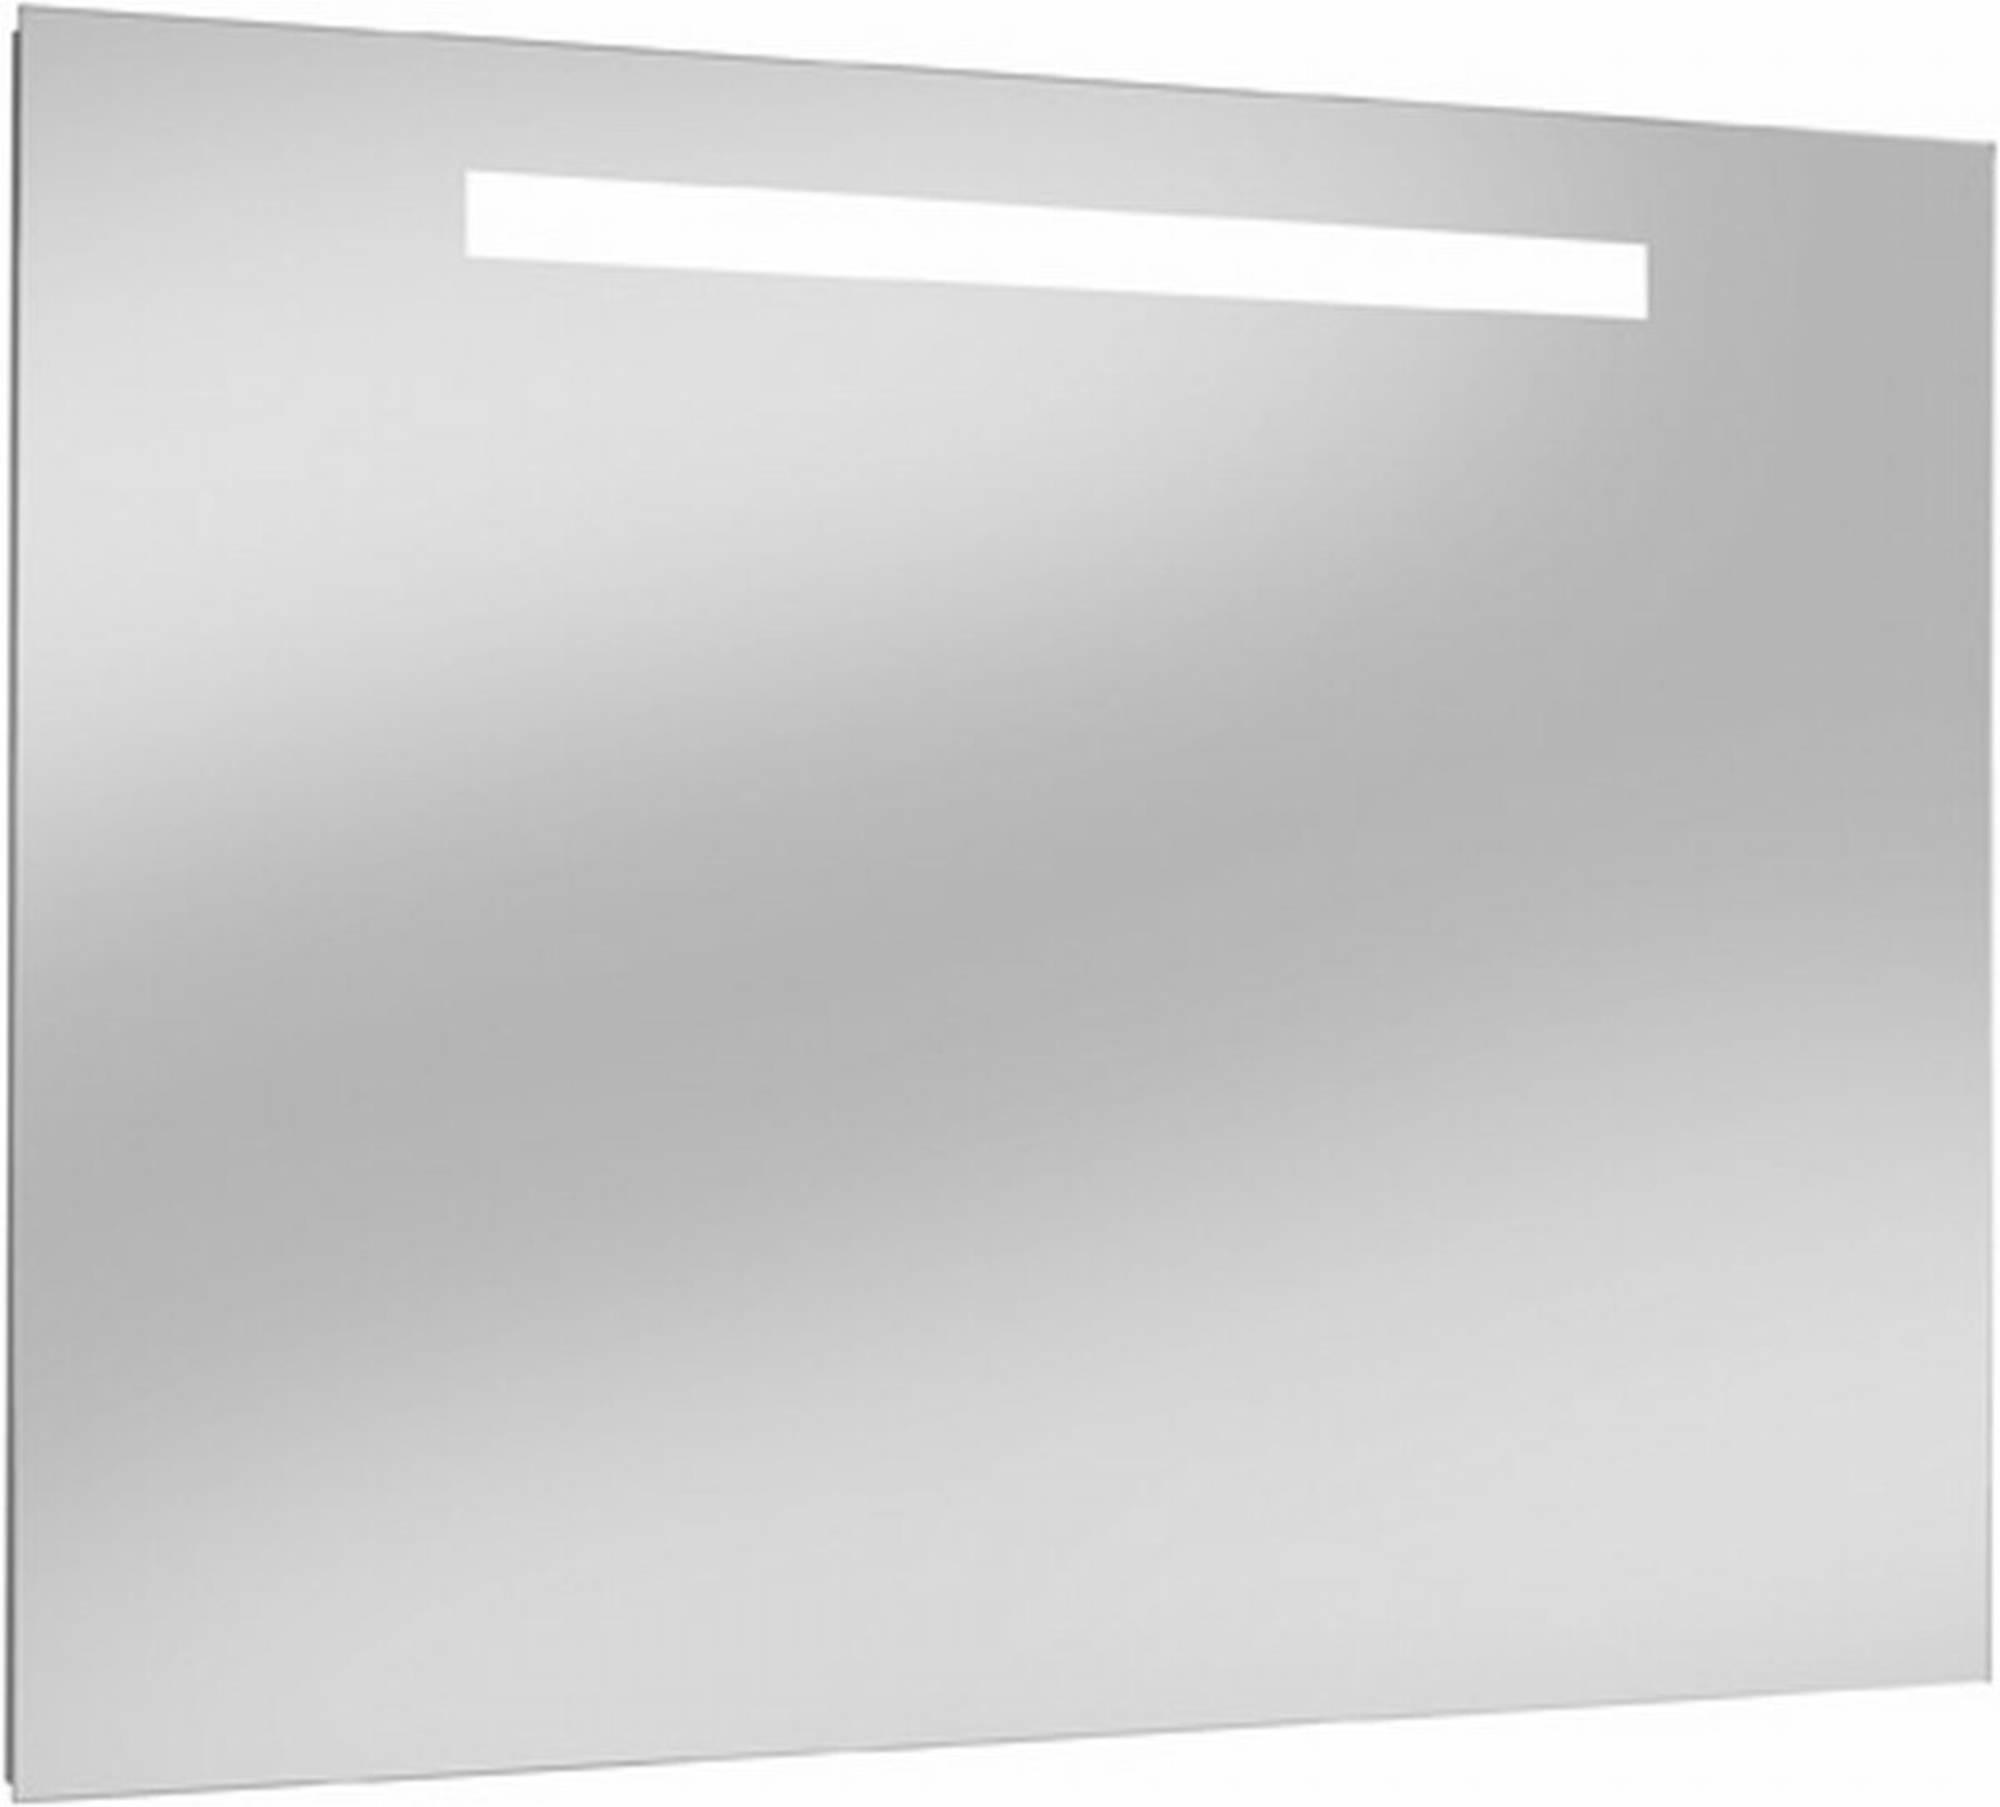 Villeroy & boch More to see one spiegel 120x60x3 cm, met led verlichting